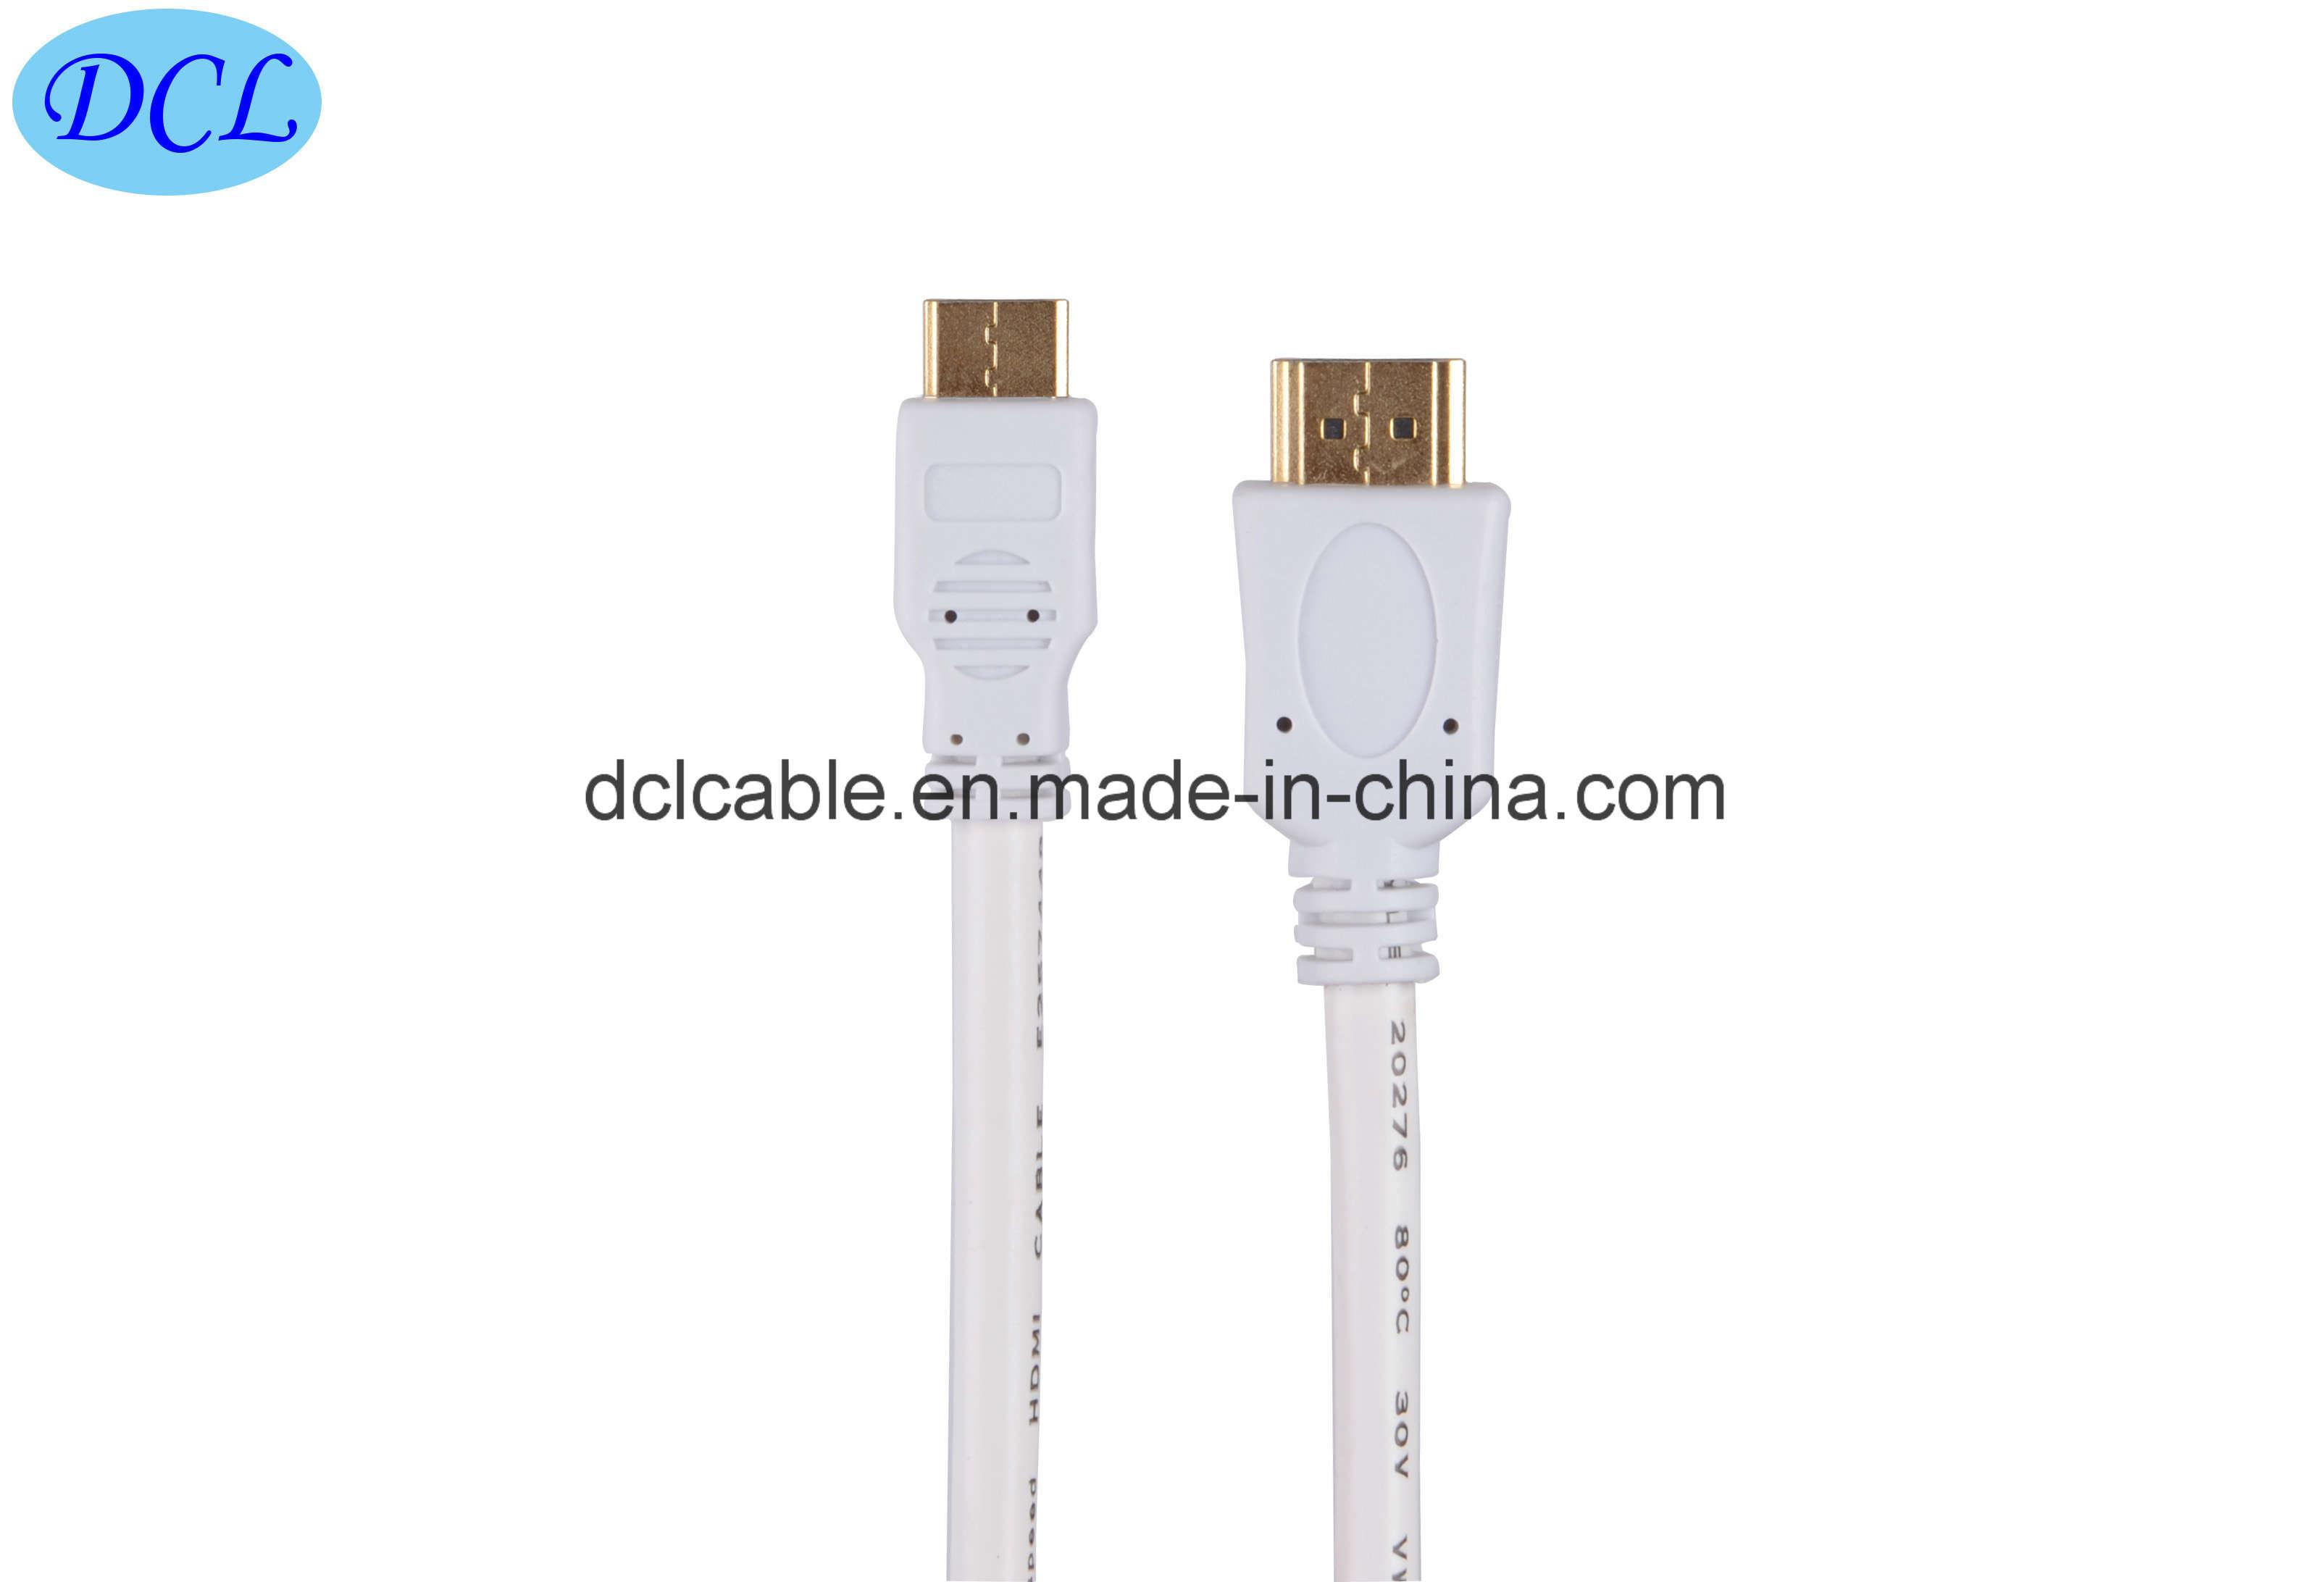 1.4V Mini HDMI Cable Support 3D/1080P